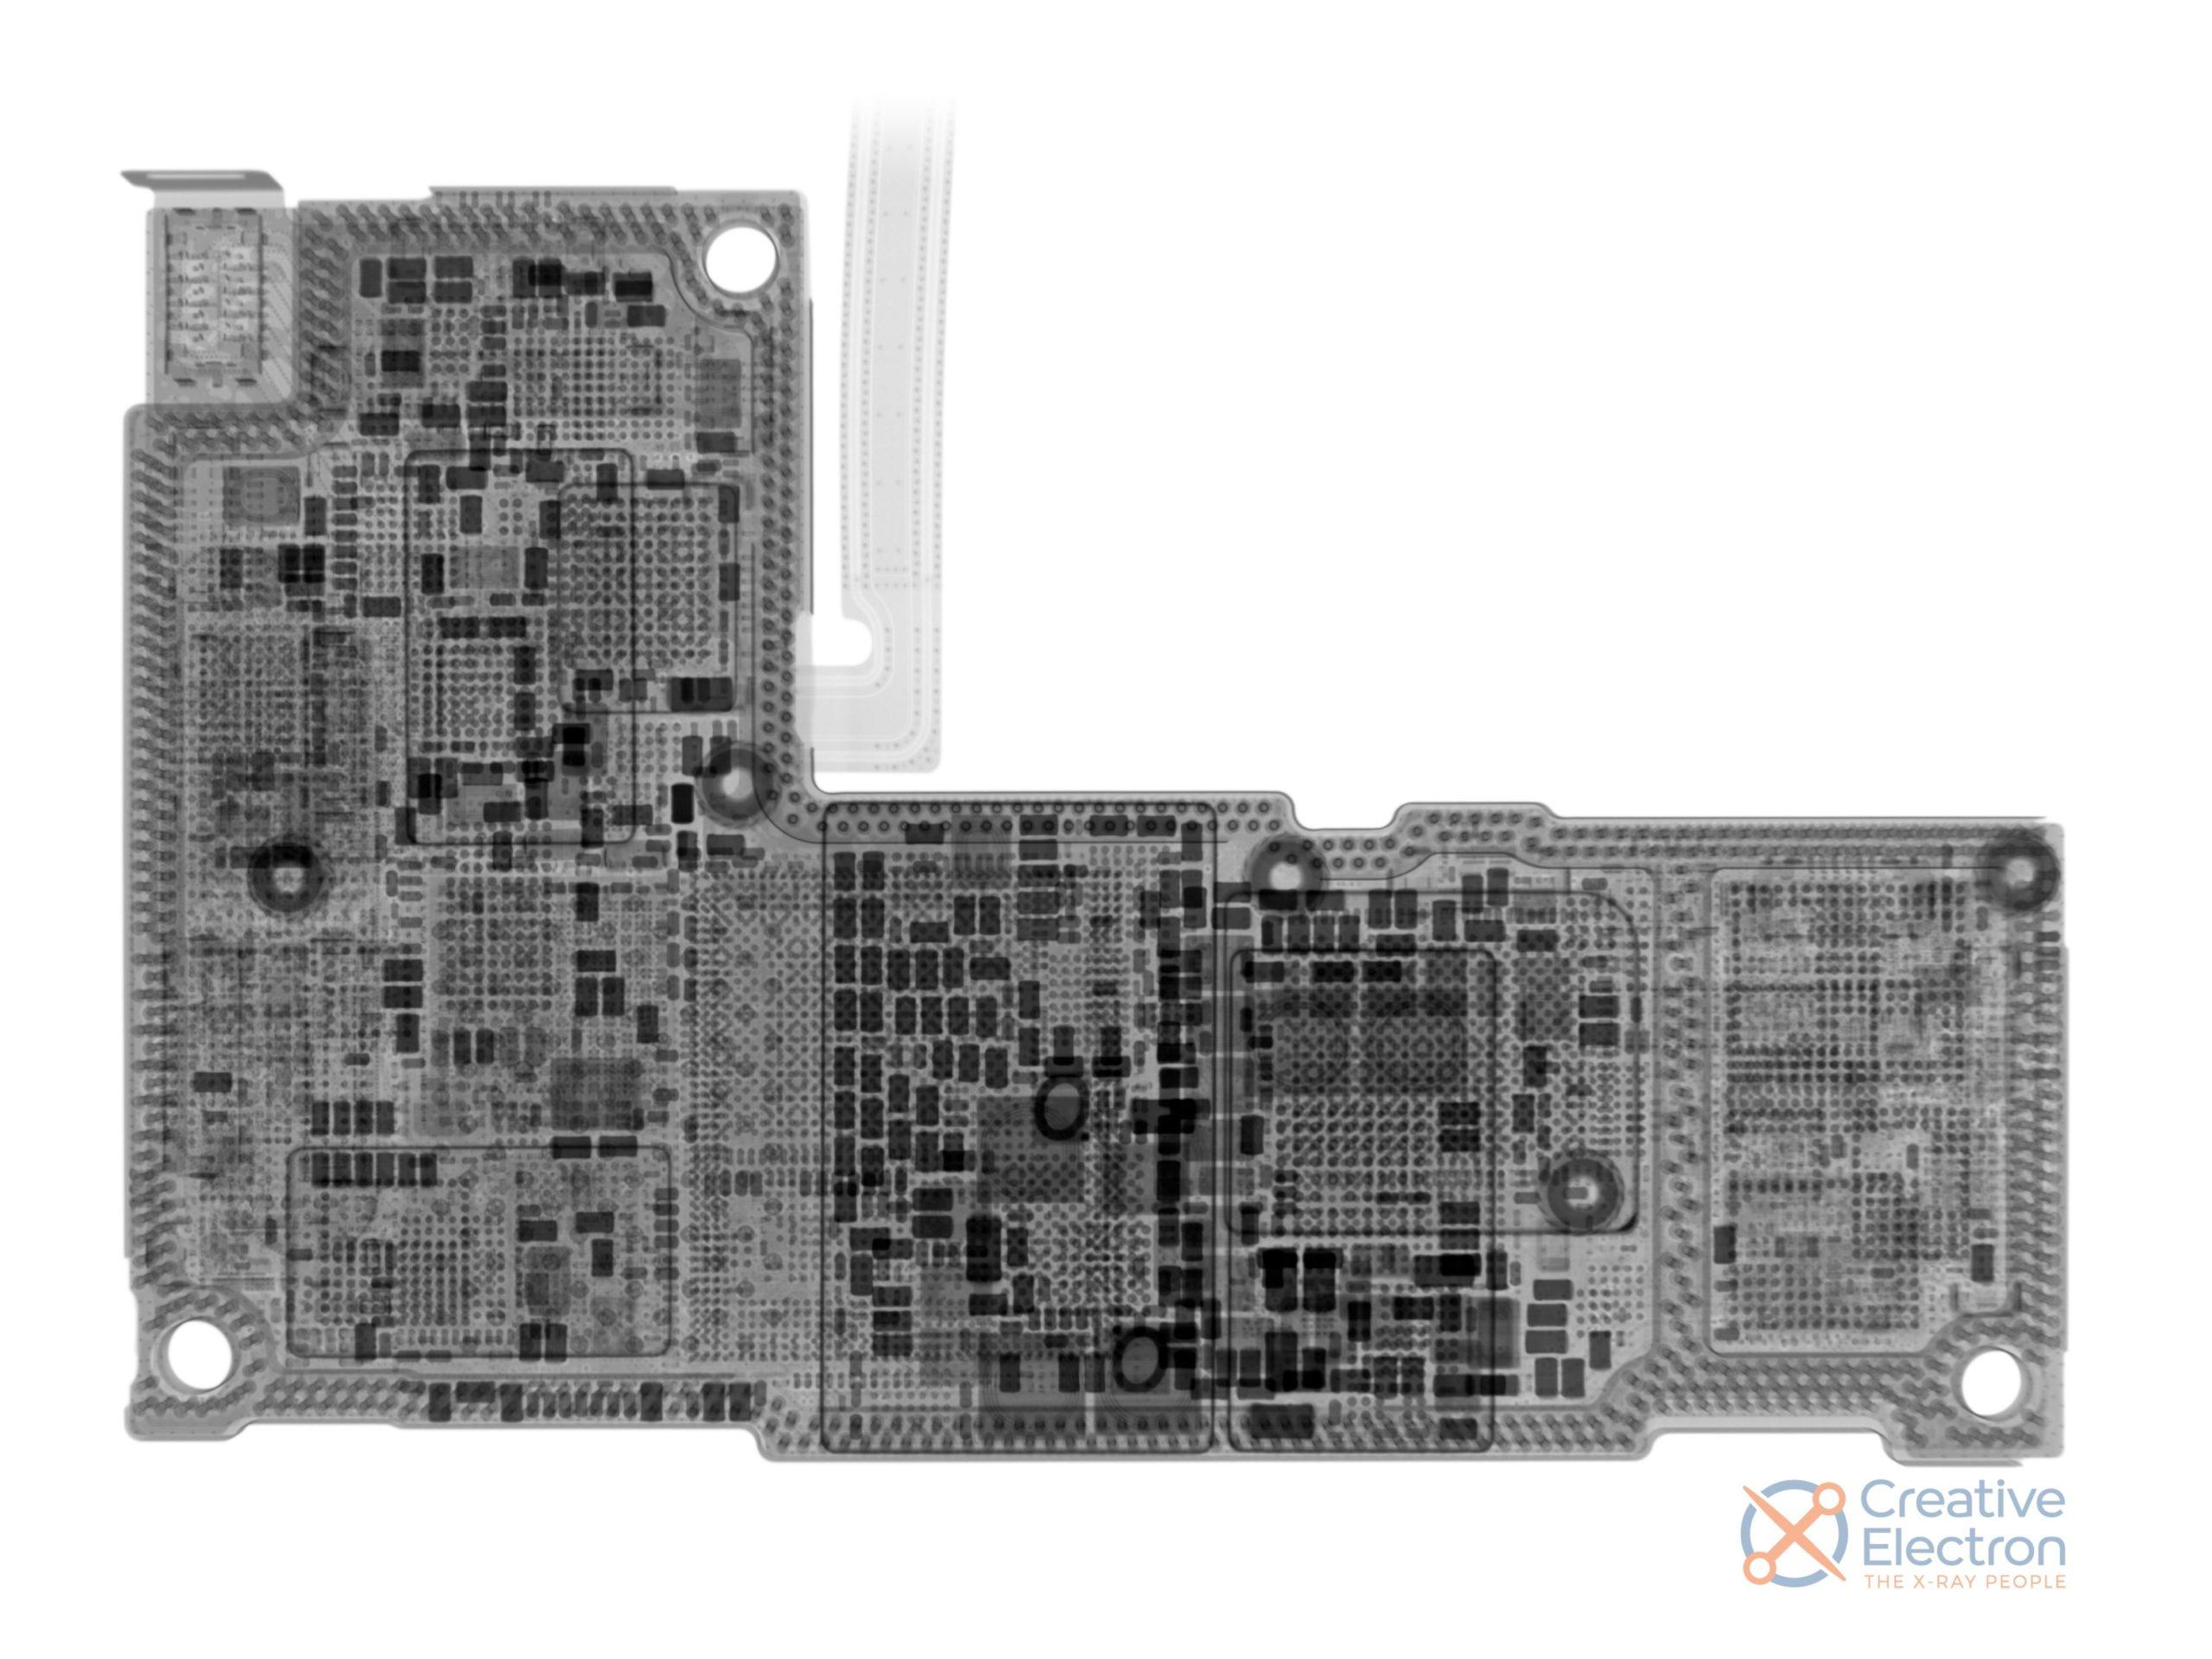 Placa base del iPhone 12 Pro Max vista a rayos x